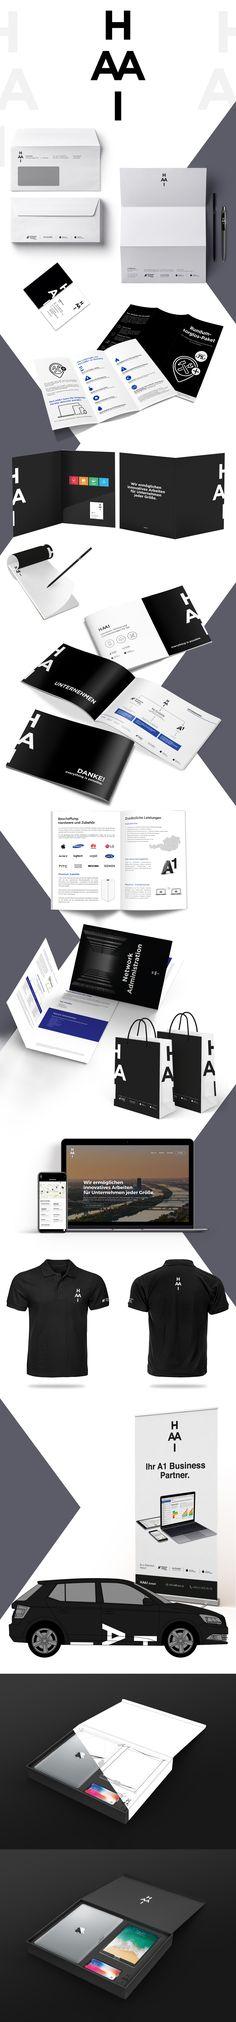 HAAI - Corporate Design - designed by Designerpart - www.designerpart.com